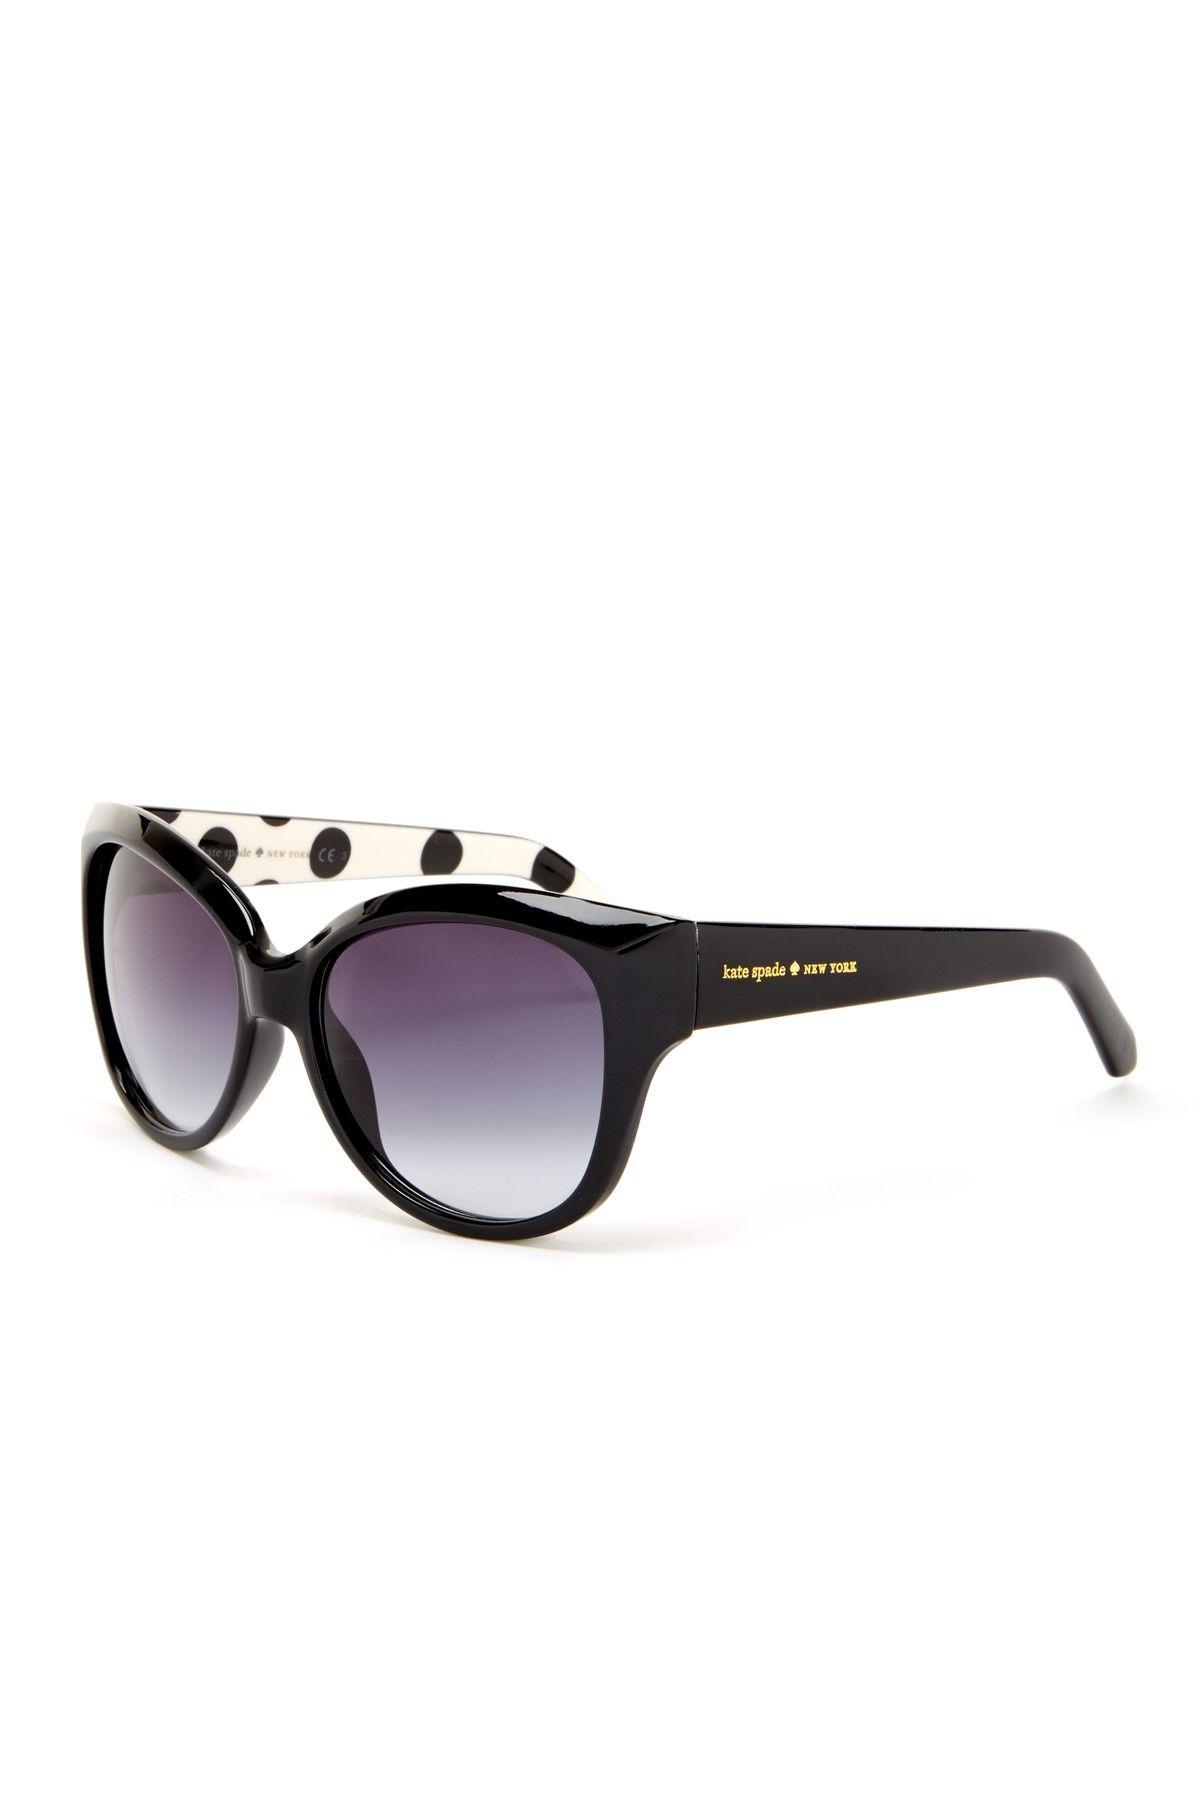 678da33172 Women s Jessa Sunglasses by kate spade new york on  nordstrom rack ...